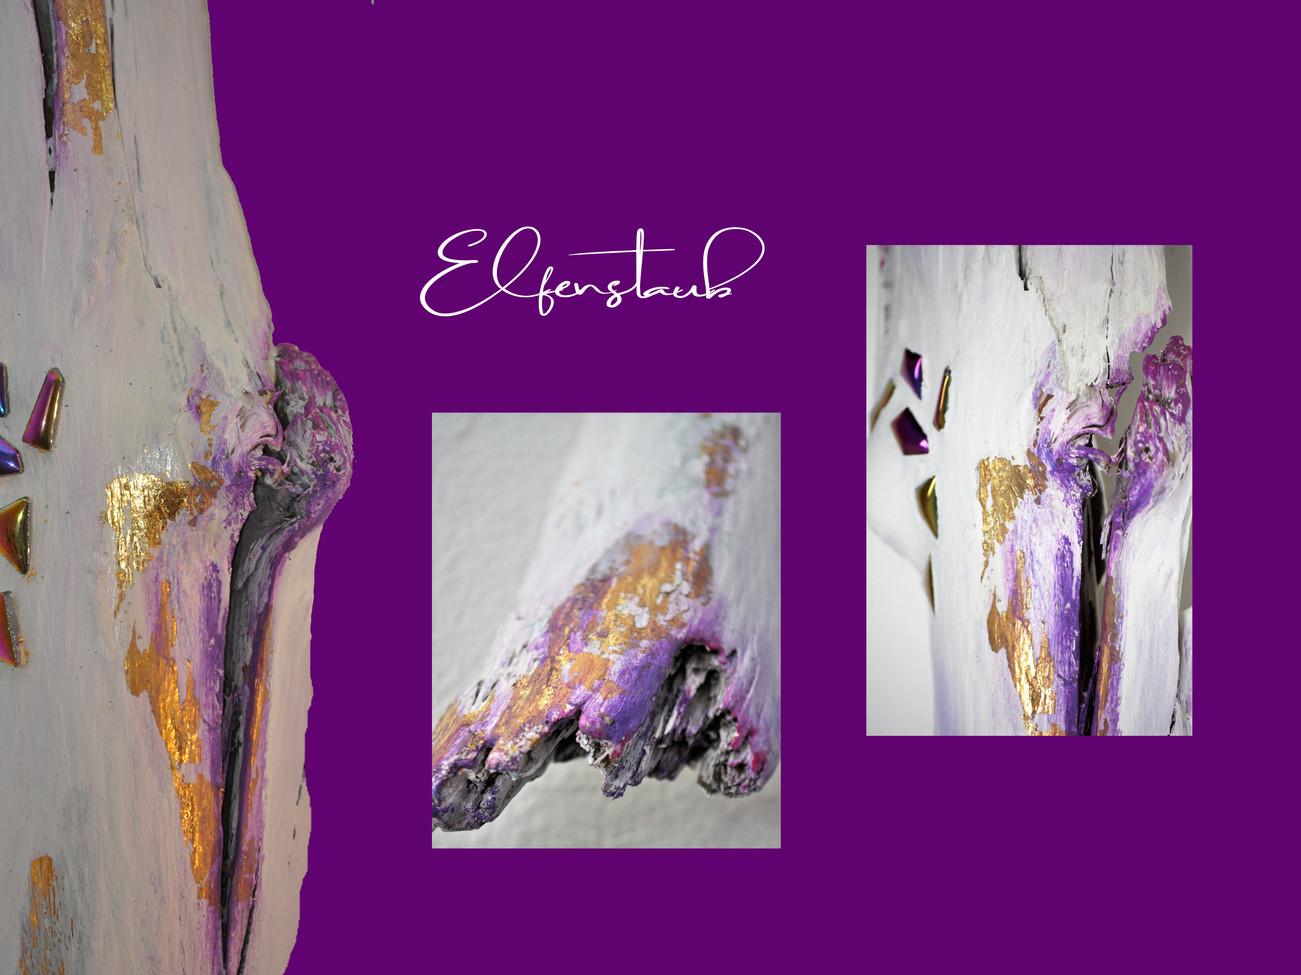 fotobuch violett weiss3.jpg